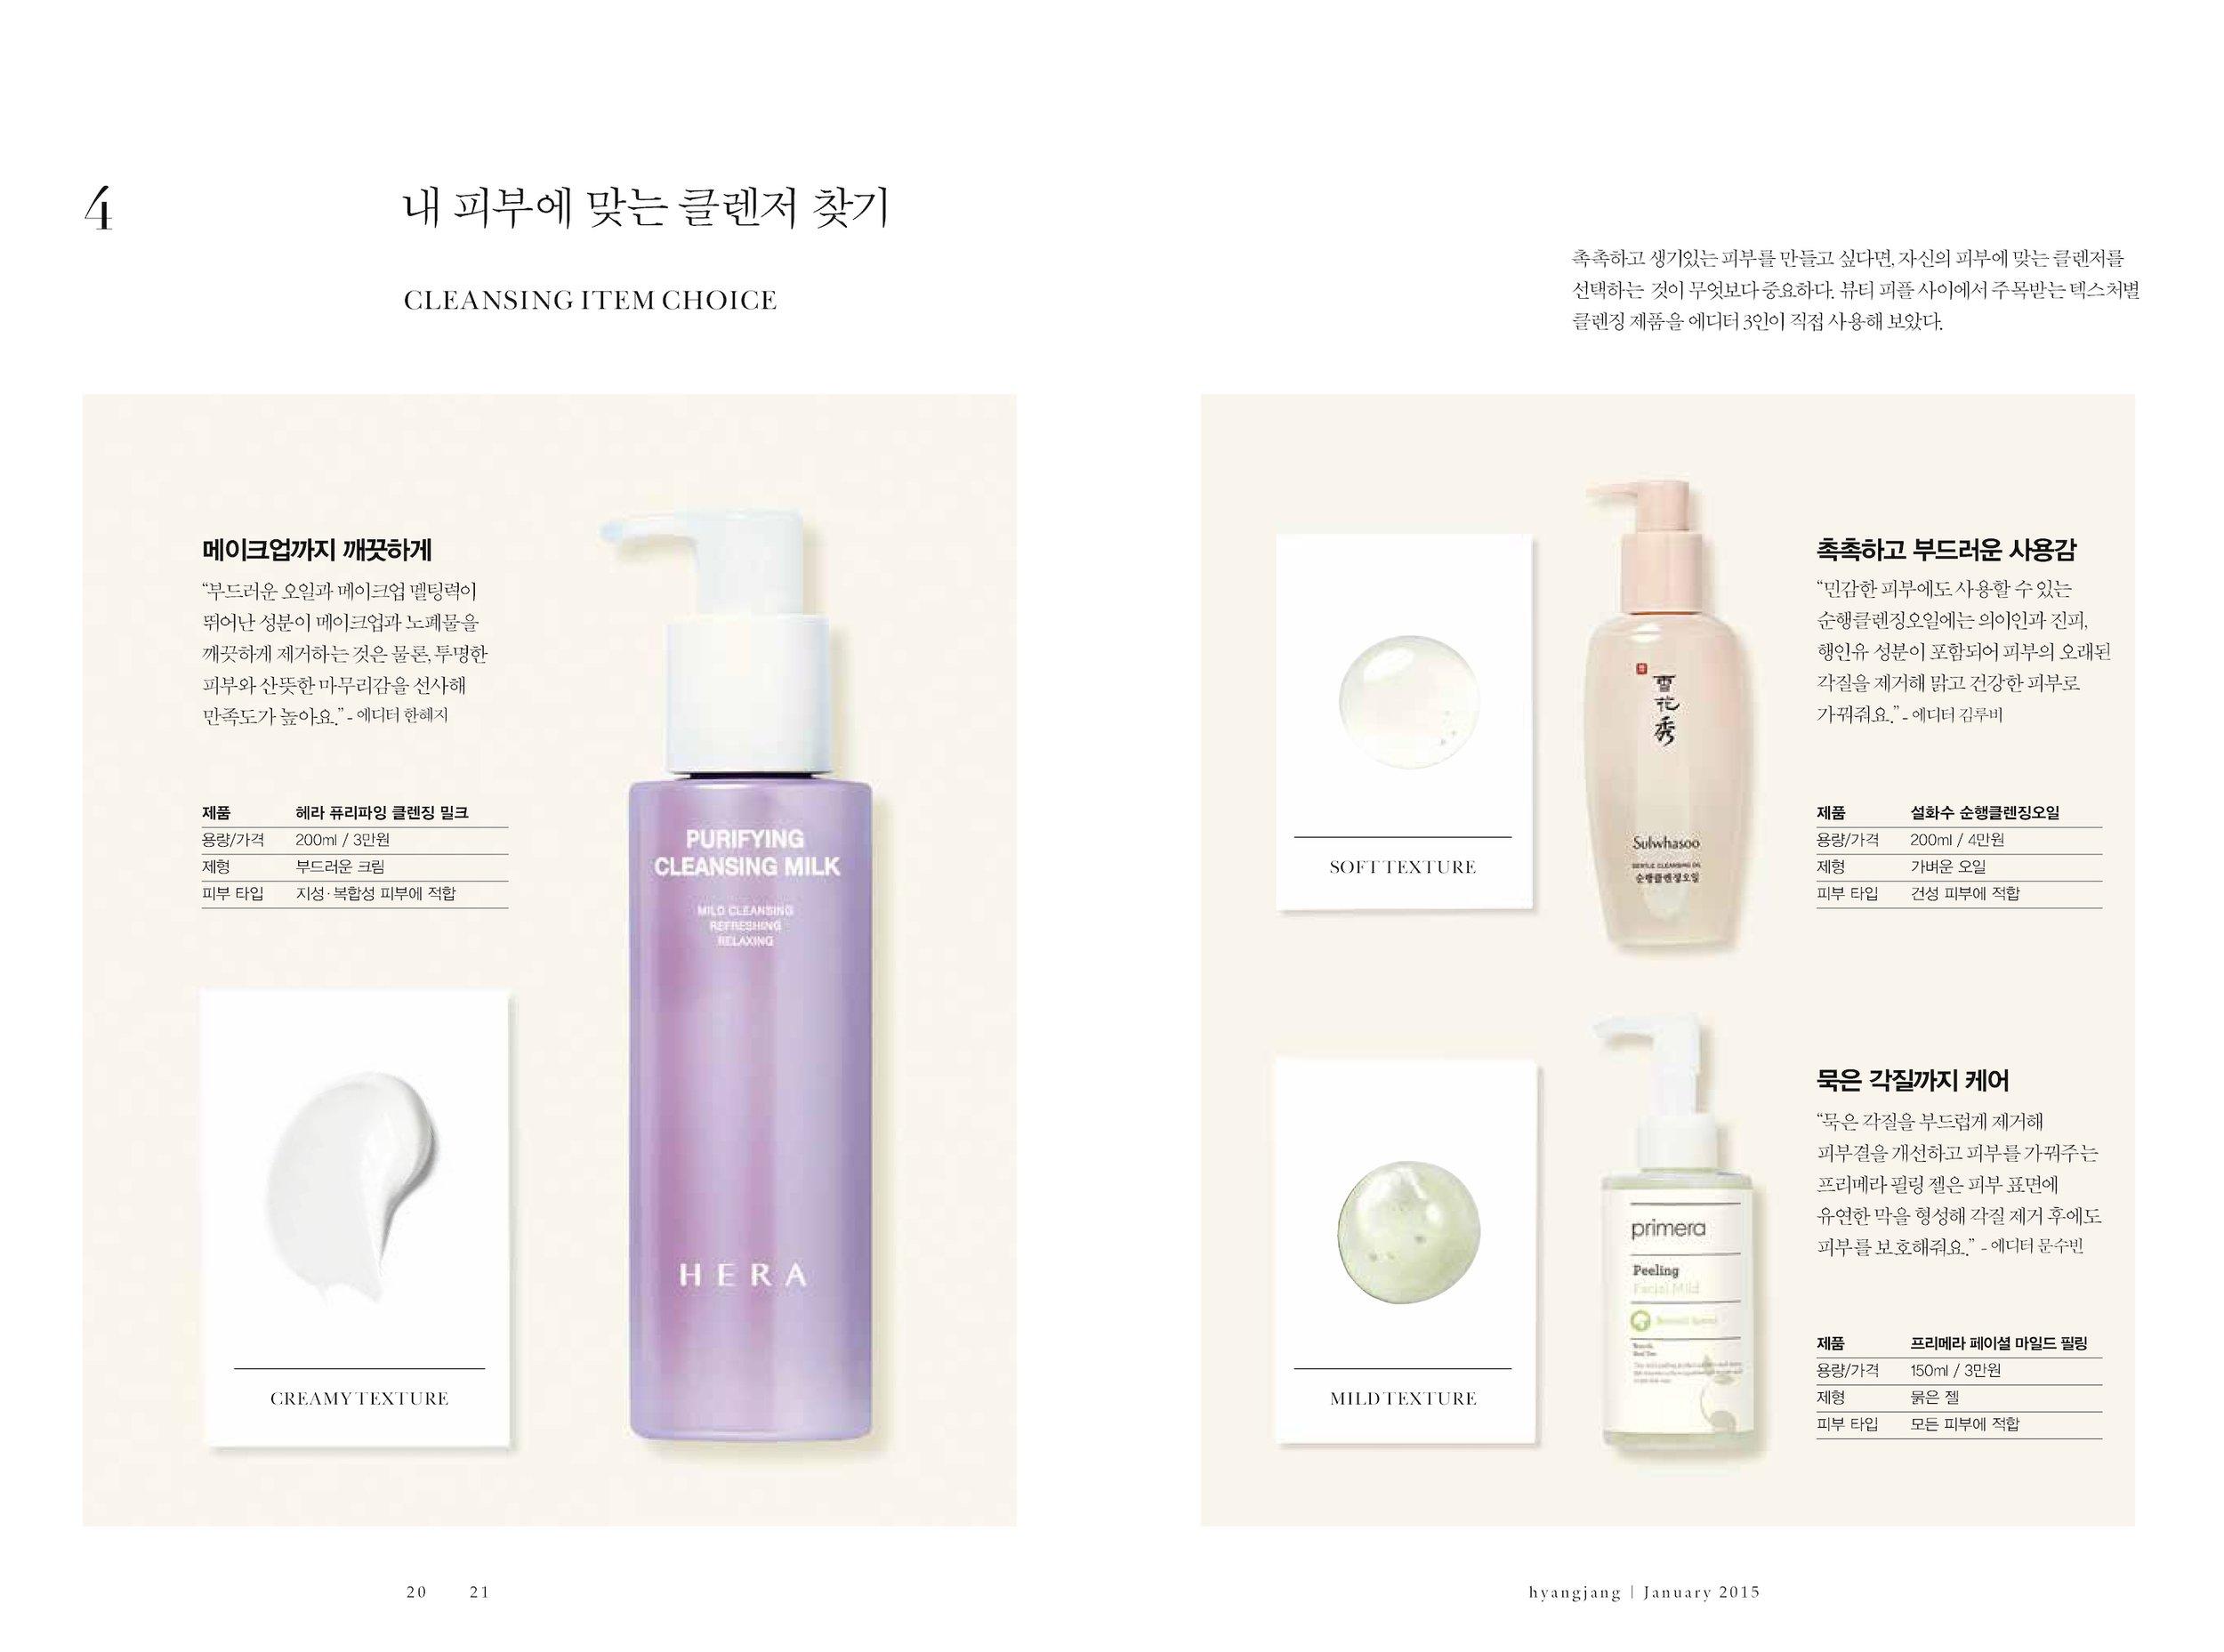 hyangjang-201501_페이지_11.jpeg